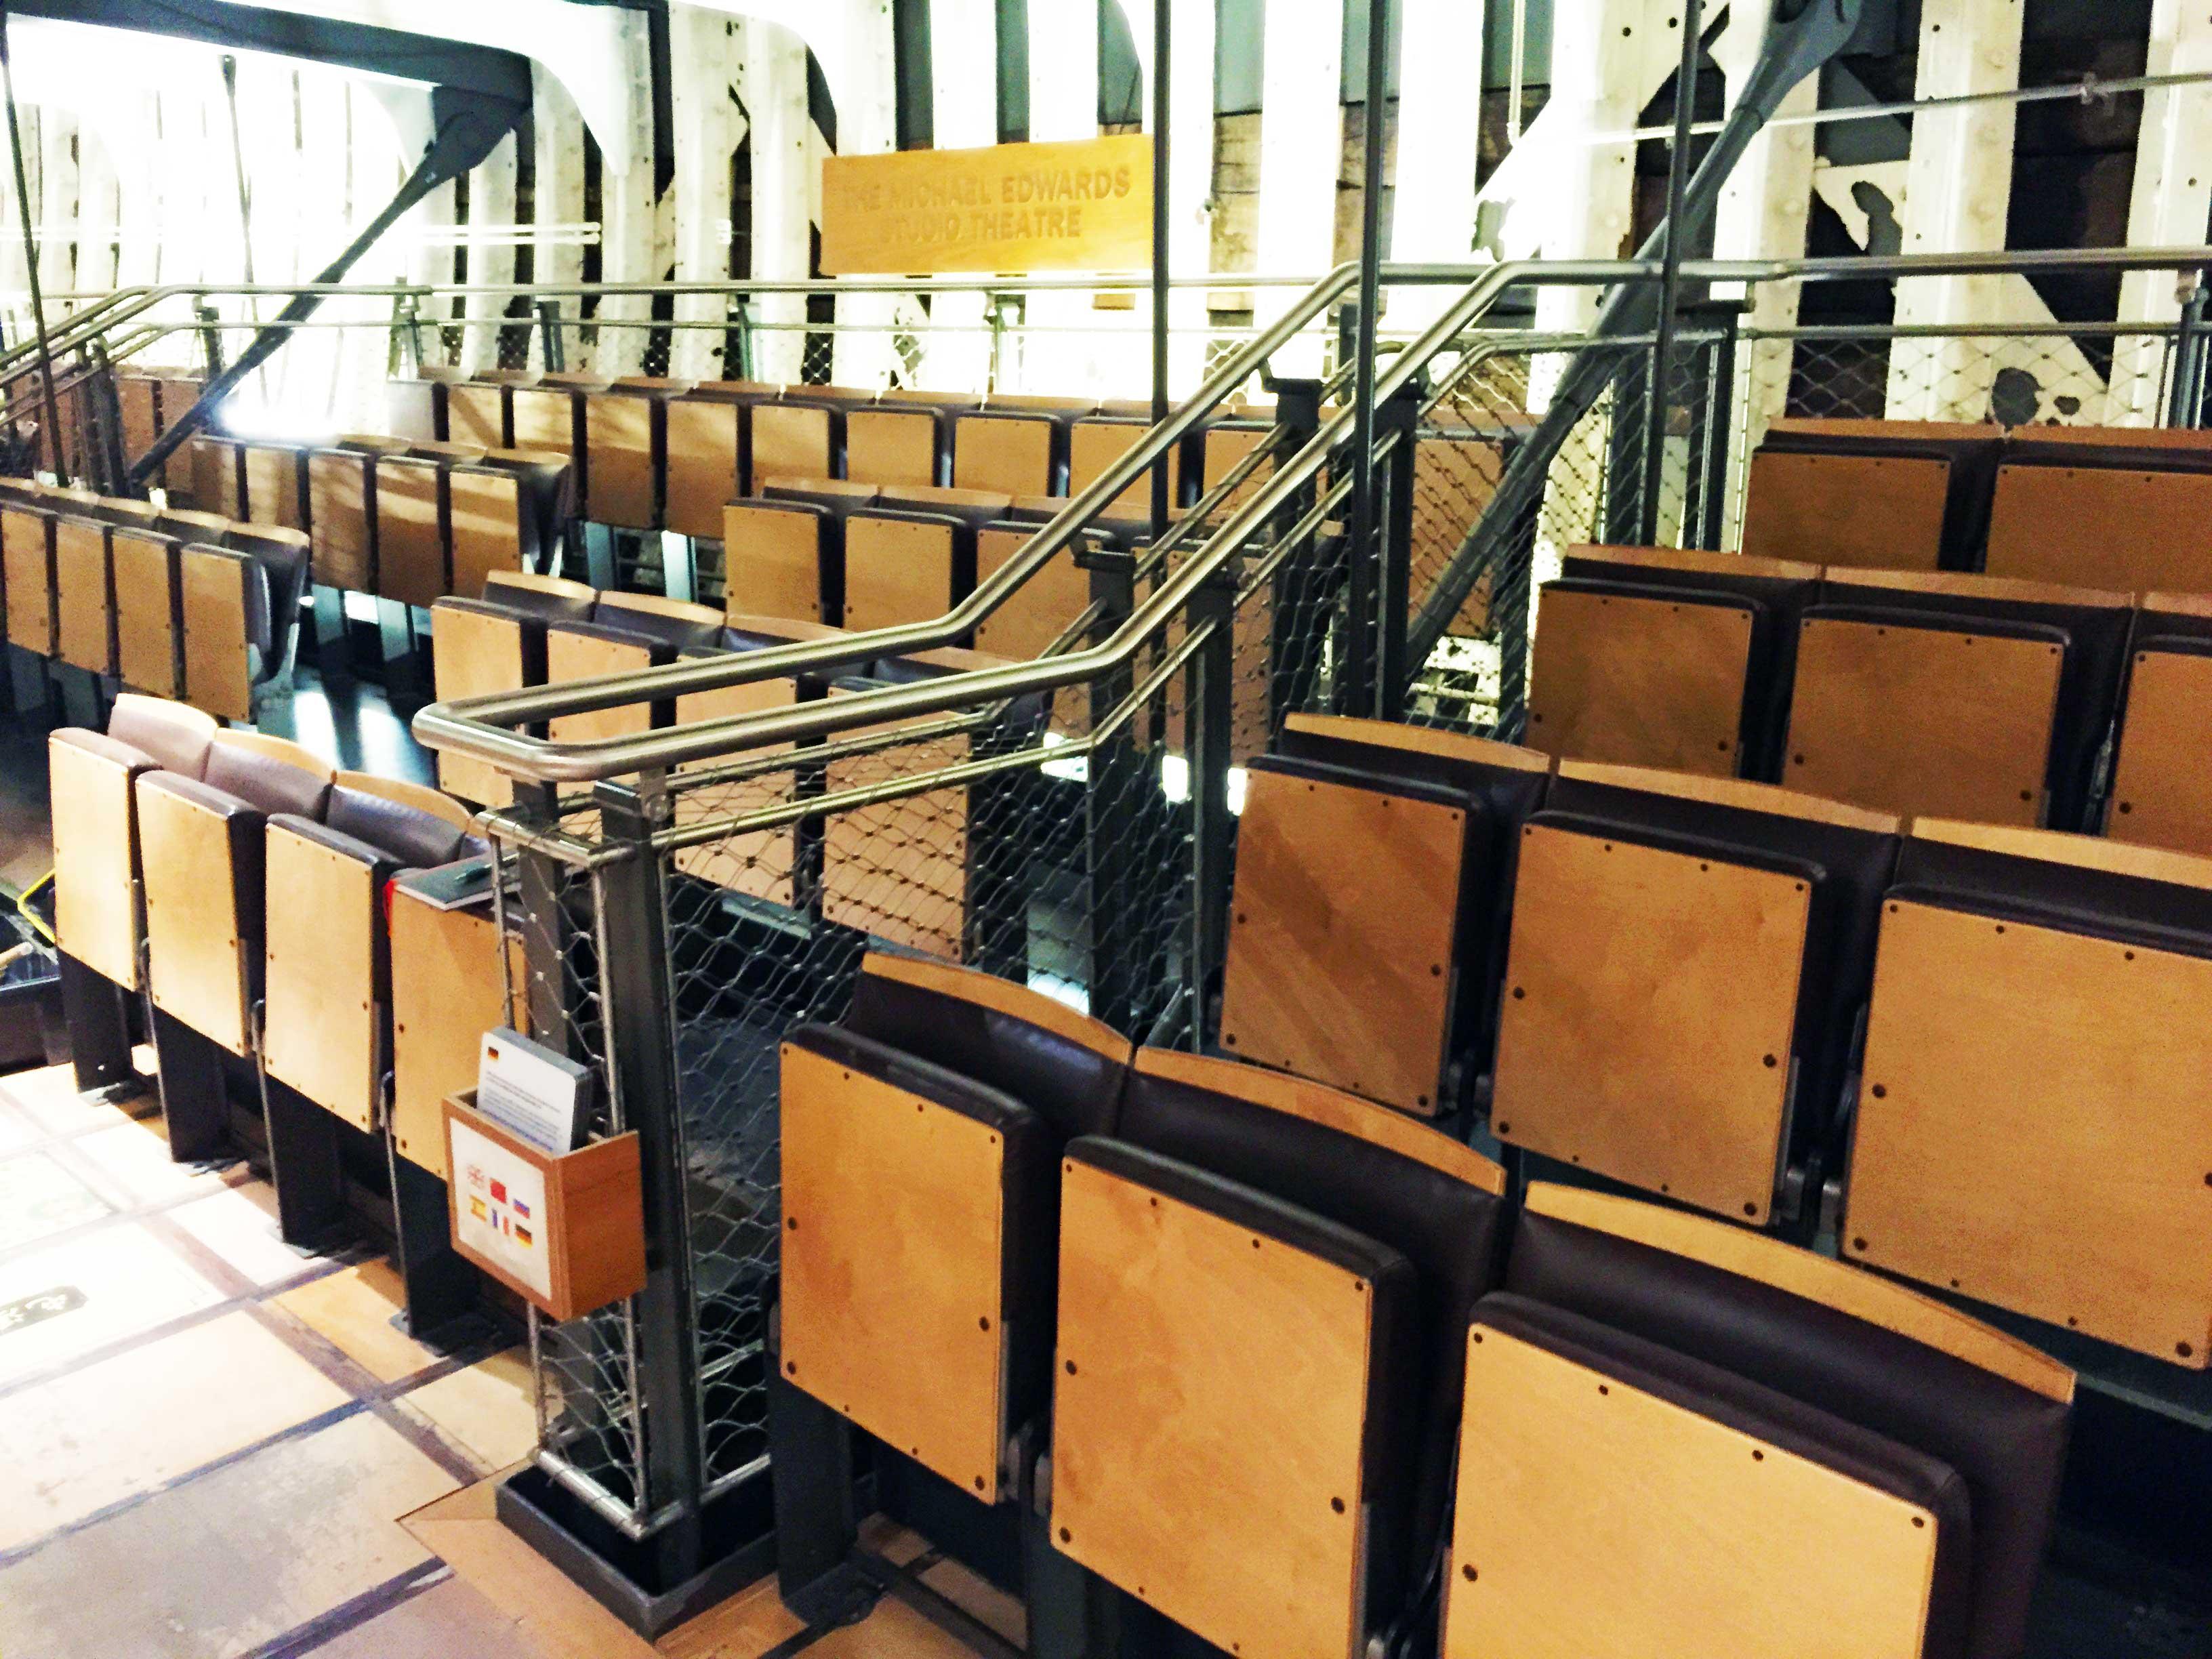 Cutty Sark custom theatre seating